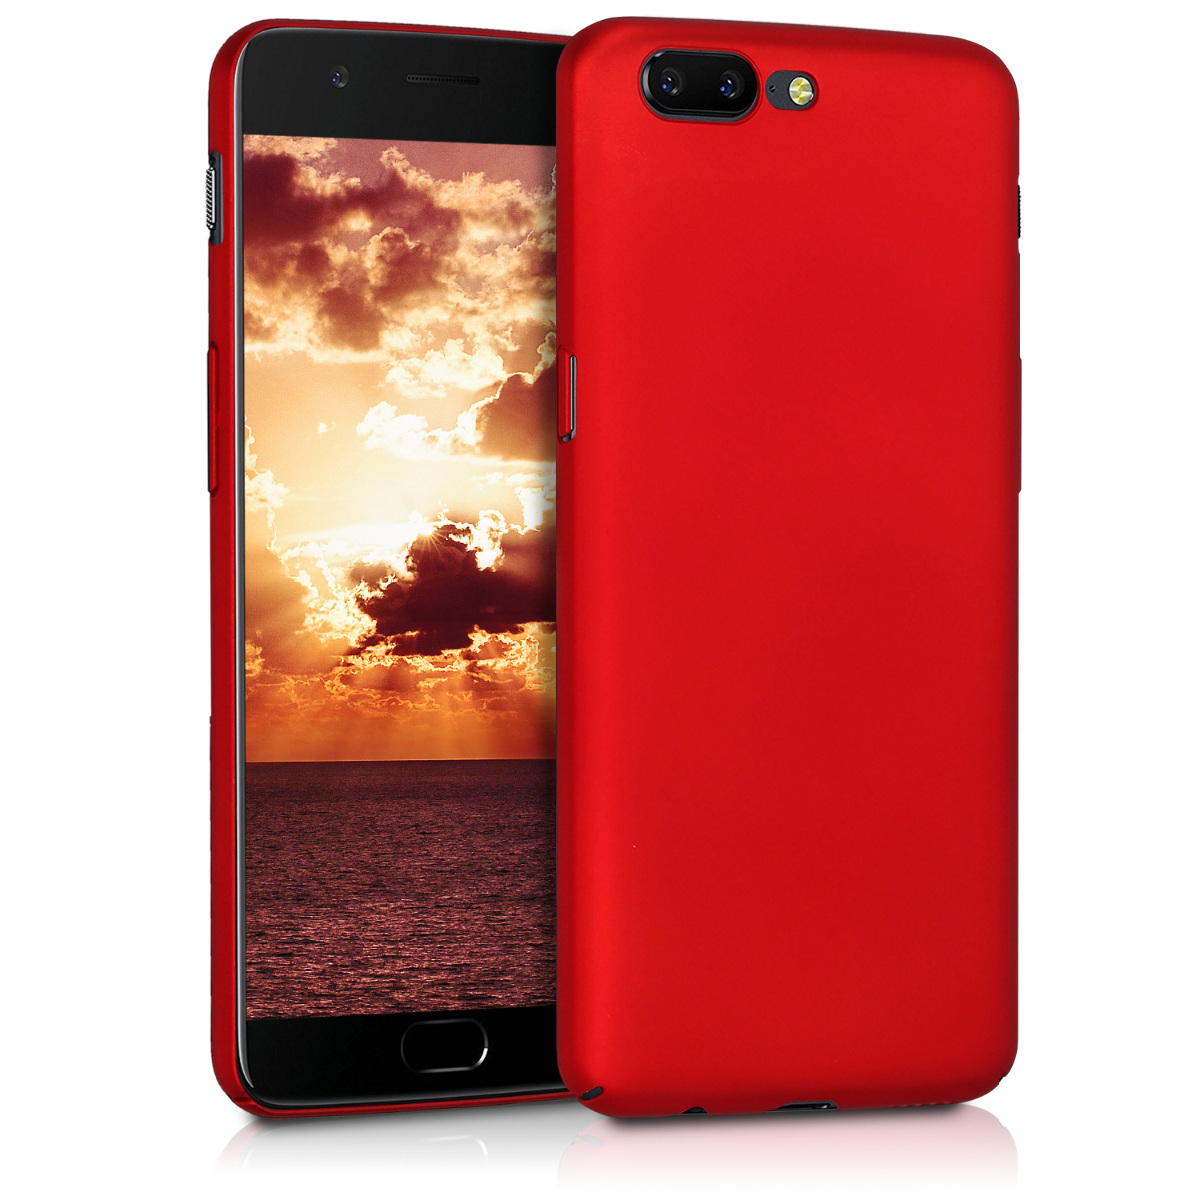 KW Slim Anti-Slip Cover - Σκληρή Θήκη Καουτσούκ OnePlus 5 - Red Matte (43259.51)